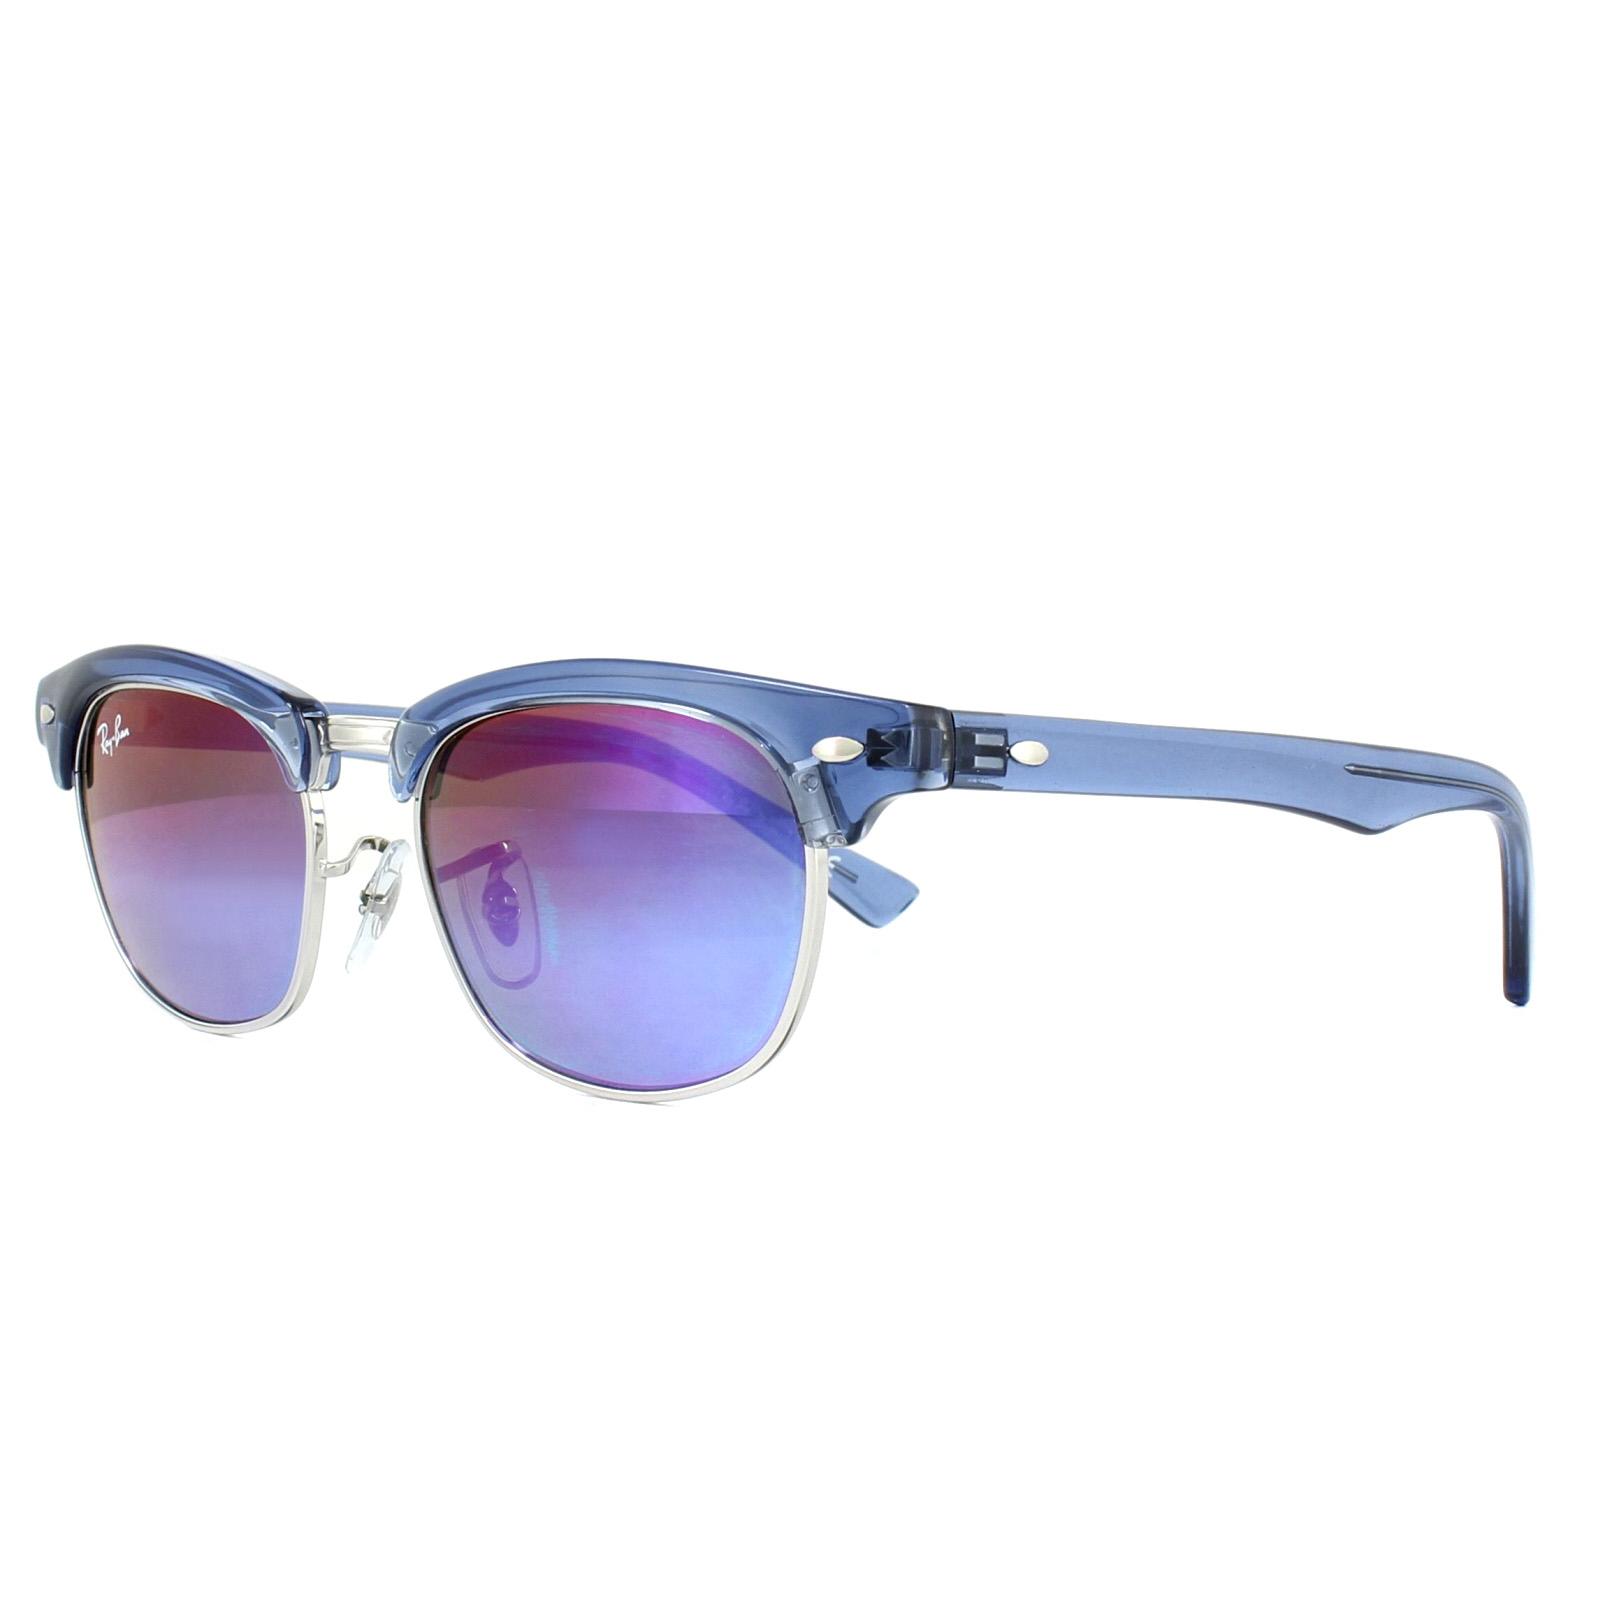 a4466e66780 Sentinel Ray-Ban Junior Sunglasses 9050S 7037B1 Blue Blue Violet Gradient  Mirror 47mm